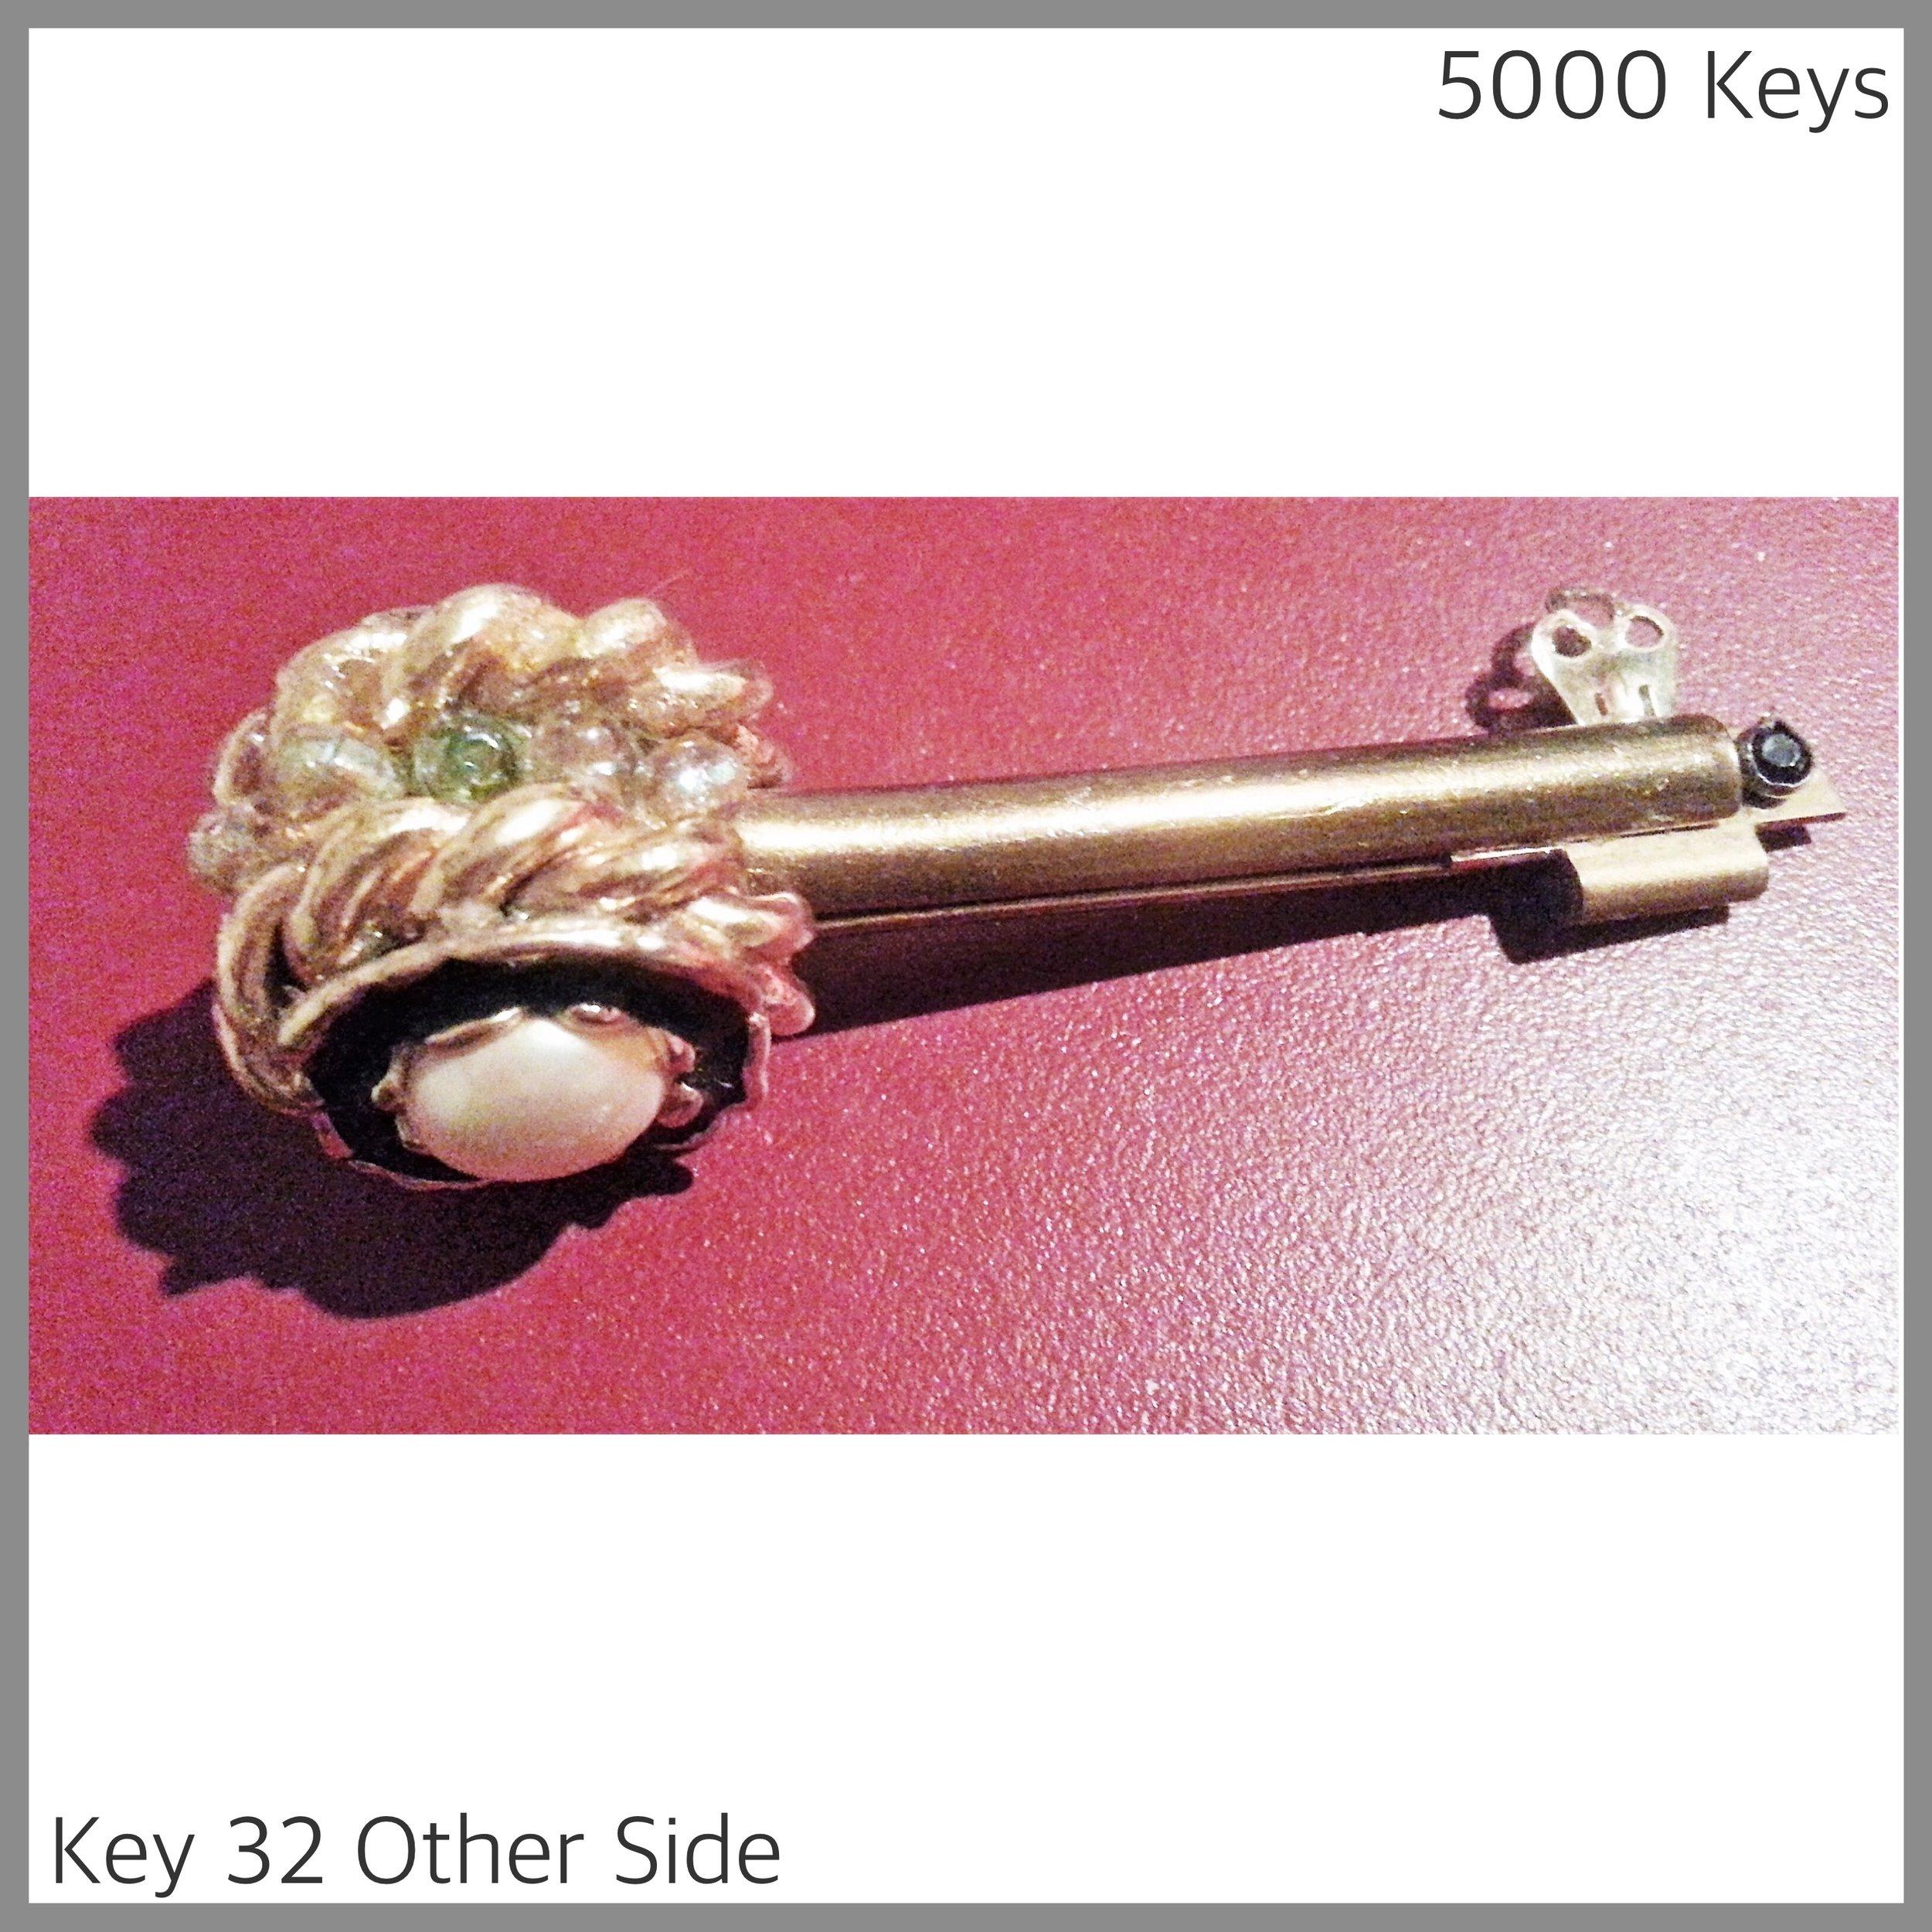 Key 32 other side.jpg